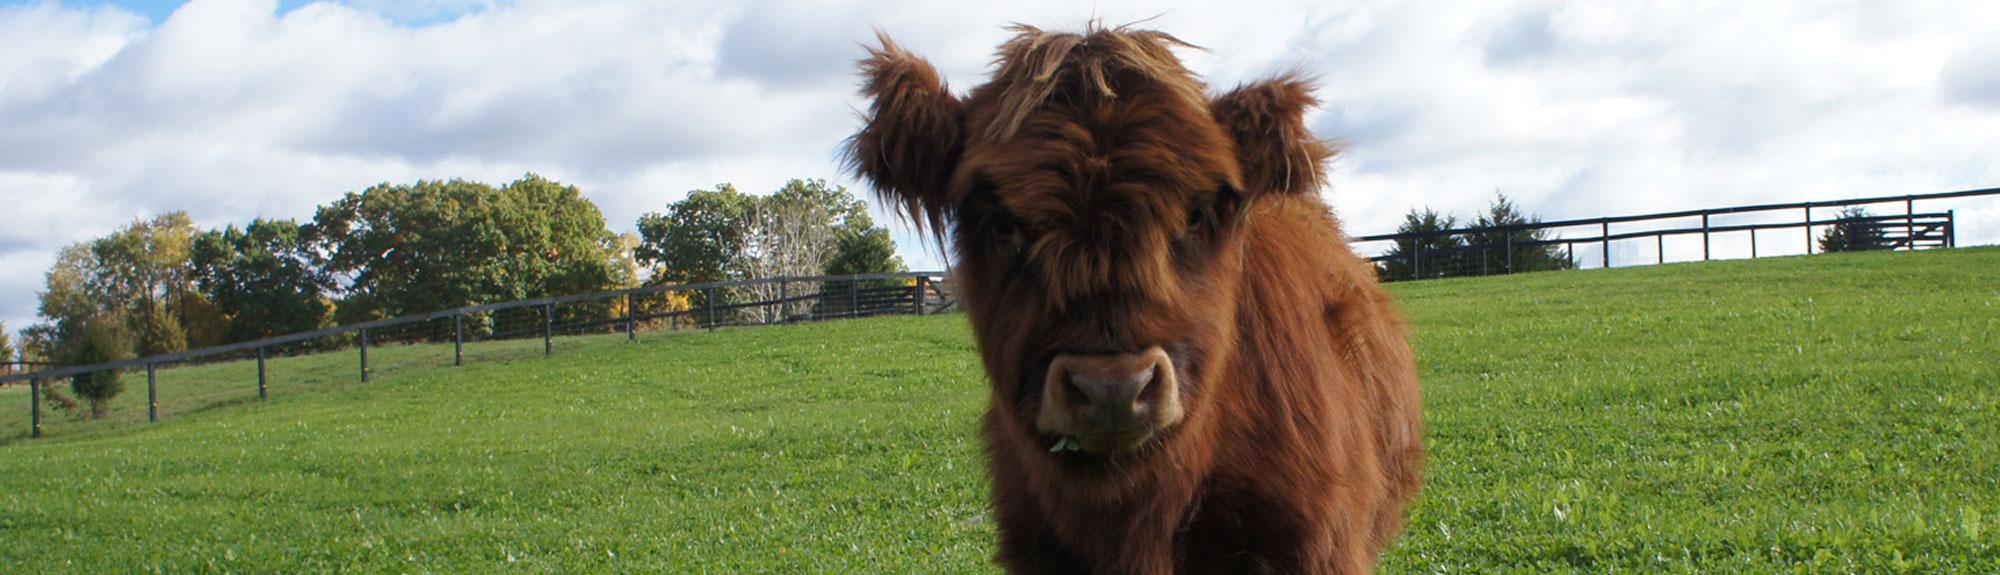 Highland cow at Robin Hills Farm